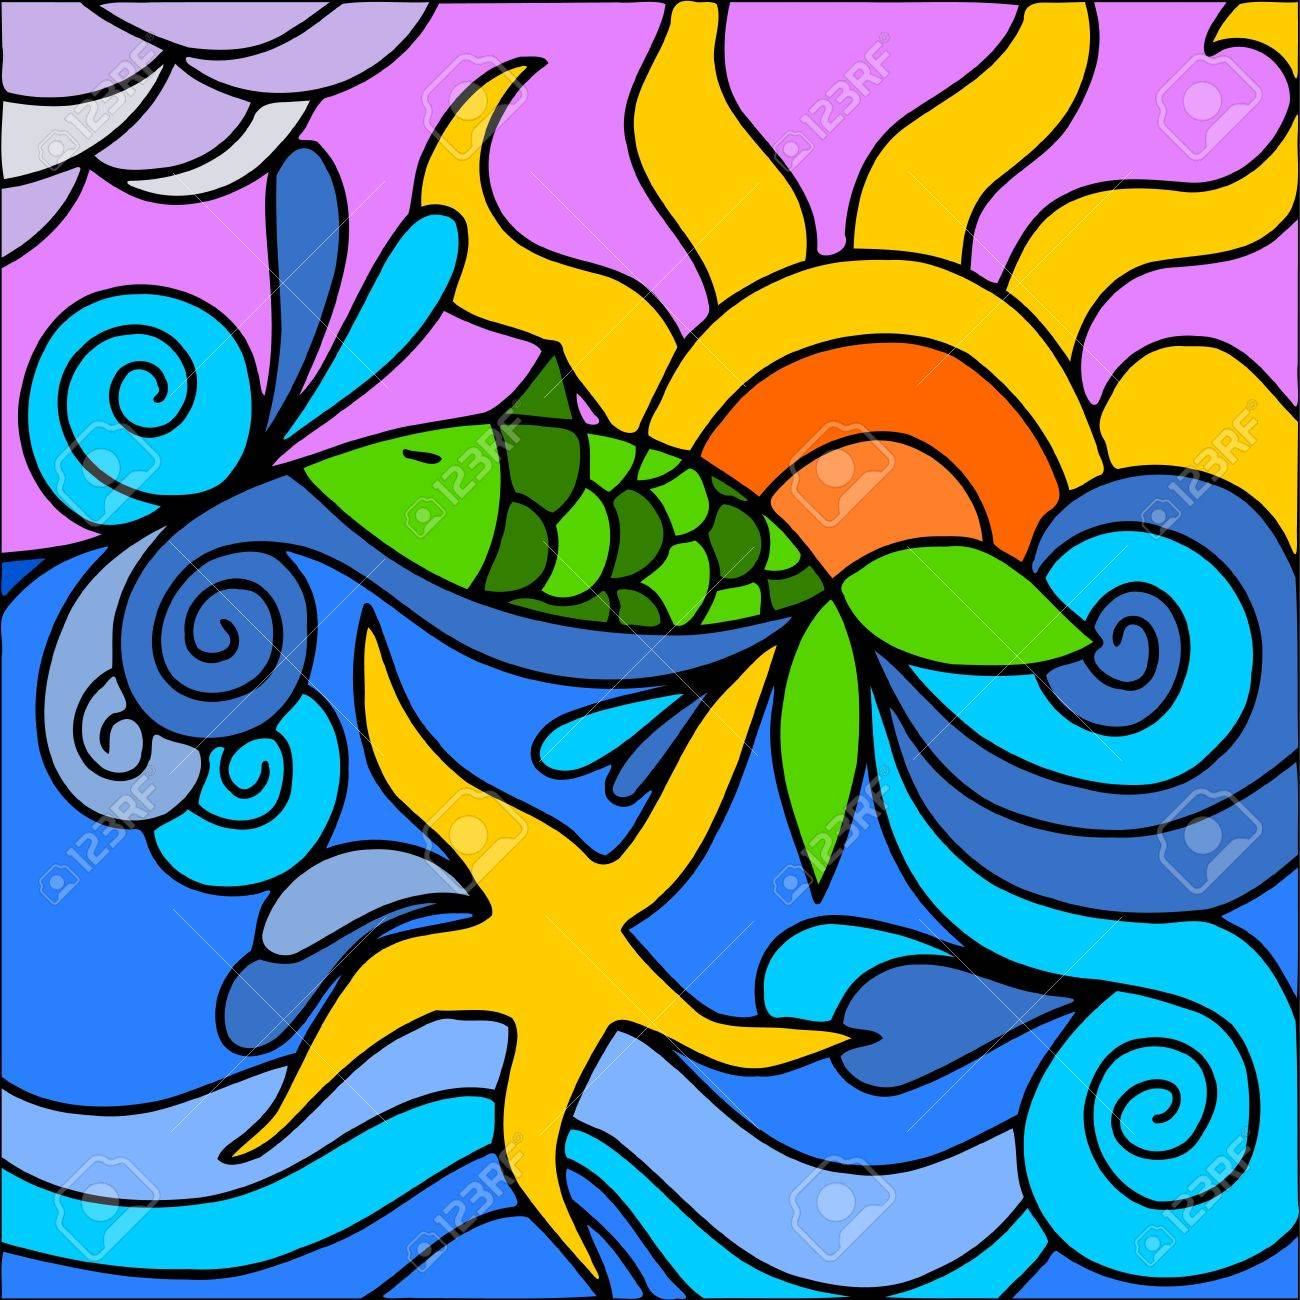 abstract illustration with sea and sun royalty free cliparts rh 123rf com Free Cartoon Sun Free Cartoon Sun